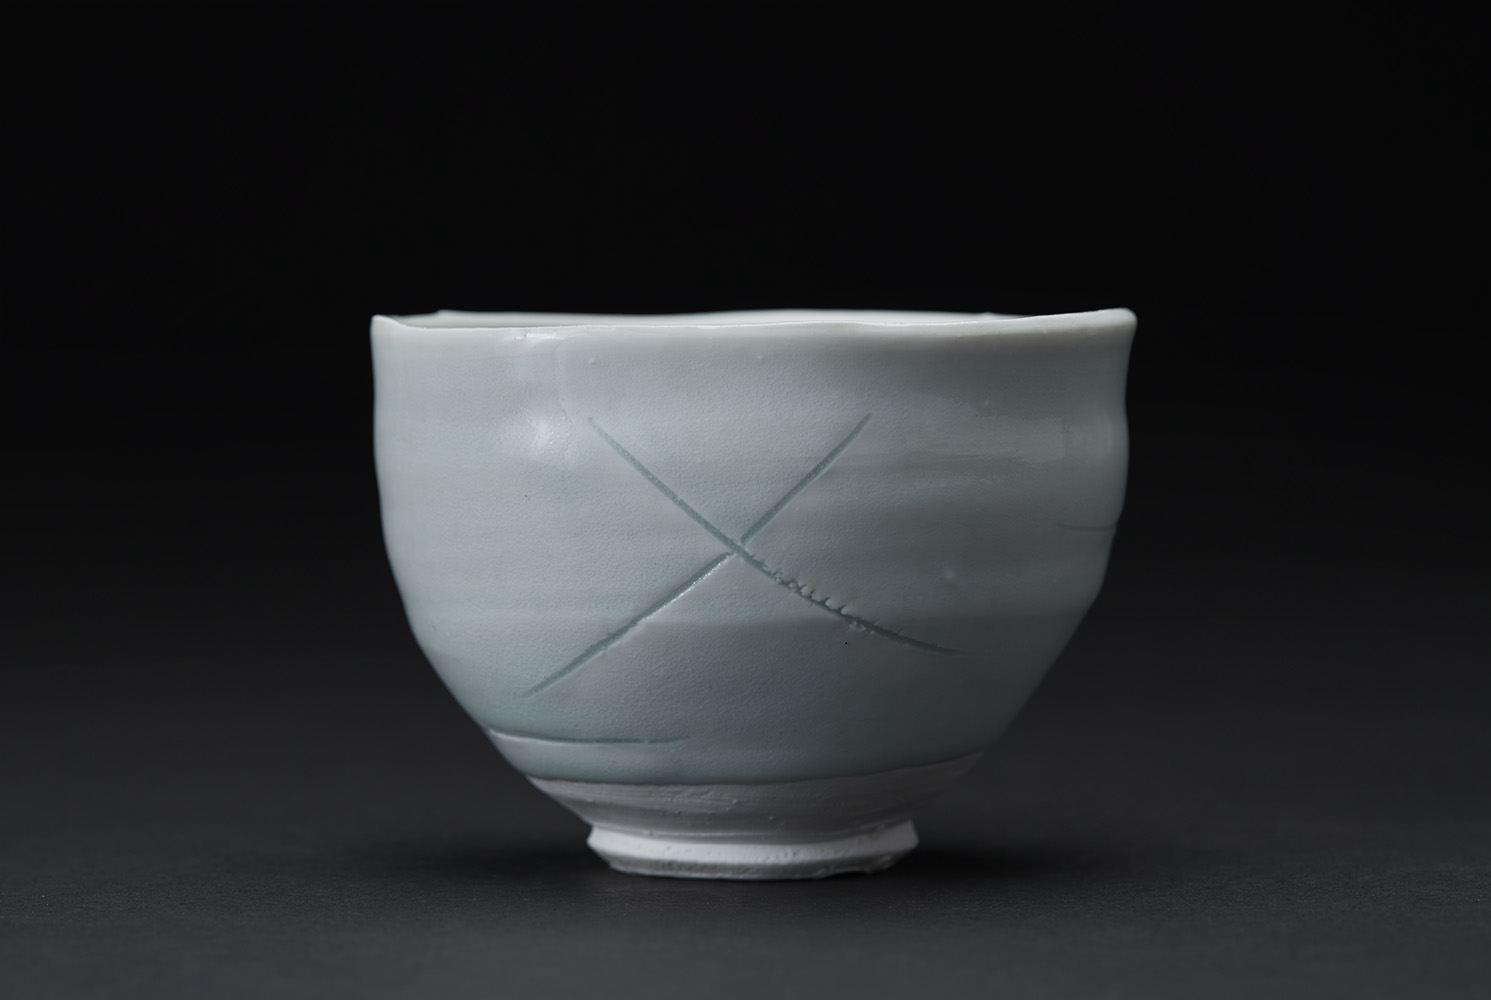 Ryoji Koie    Chawan  , 2010 Porcelain 5 x 4.75 x 3.5 inches 12.7 x 12.1 x 8.9 cm RKo 20